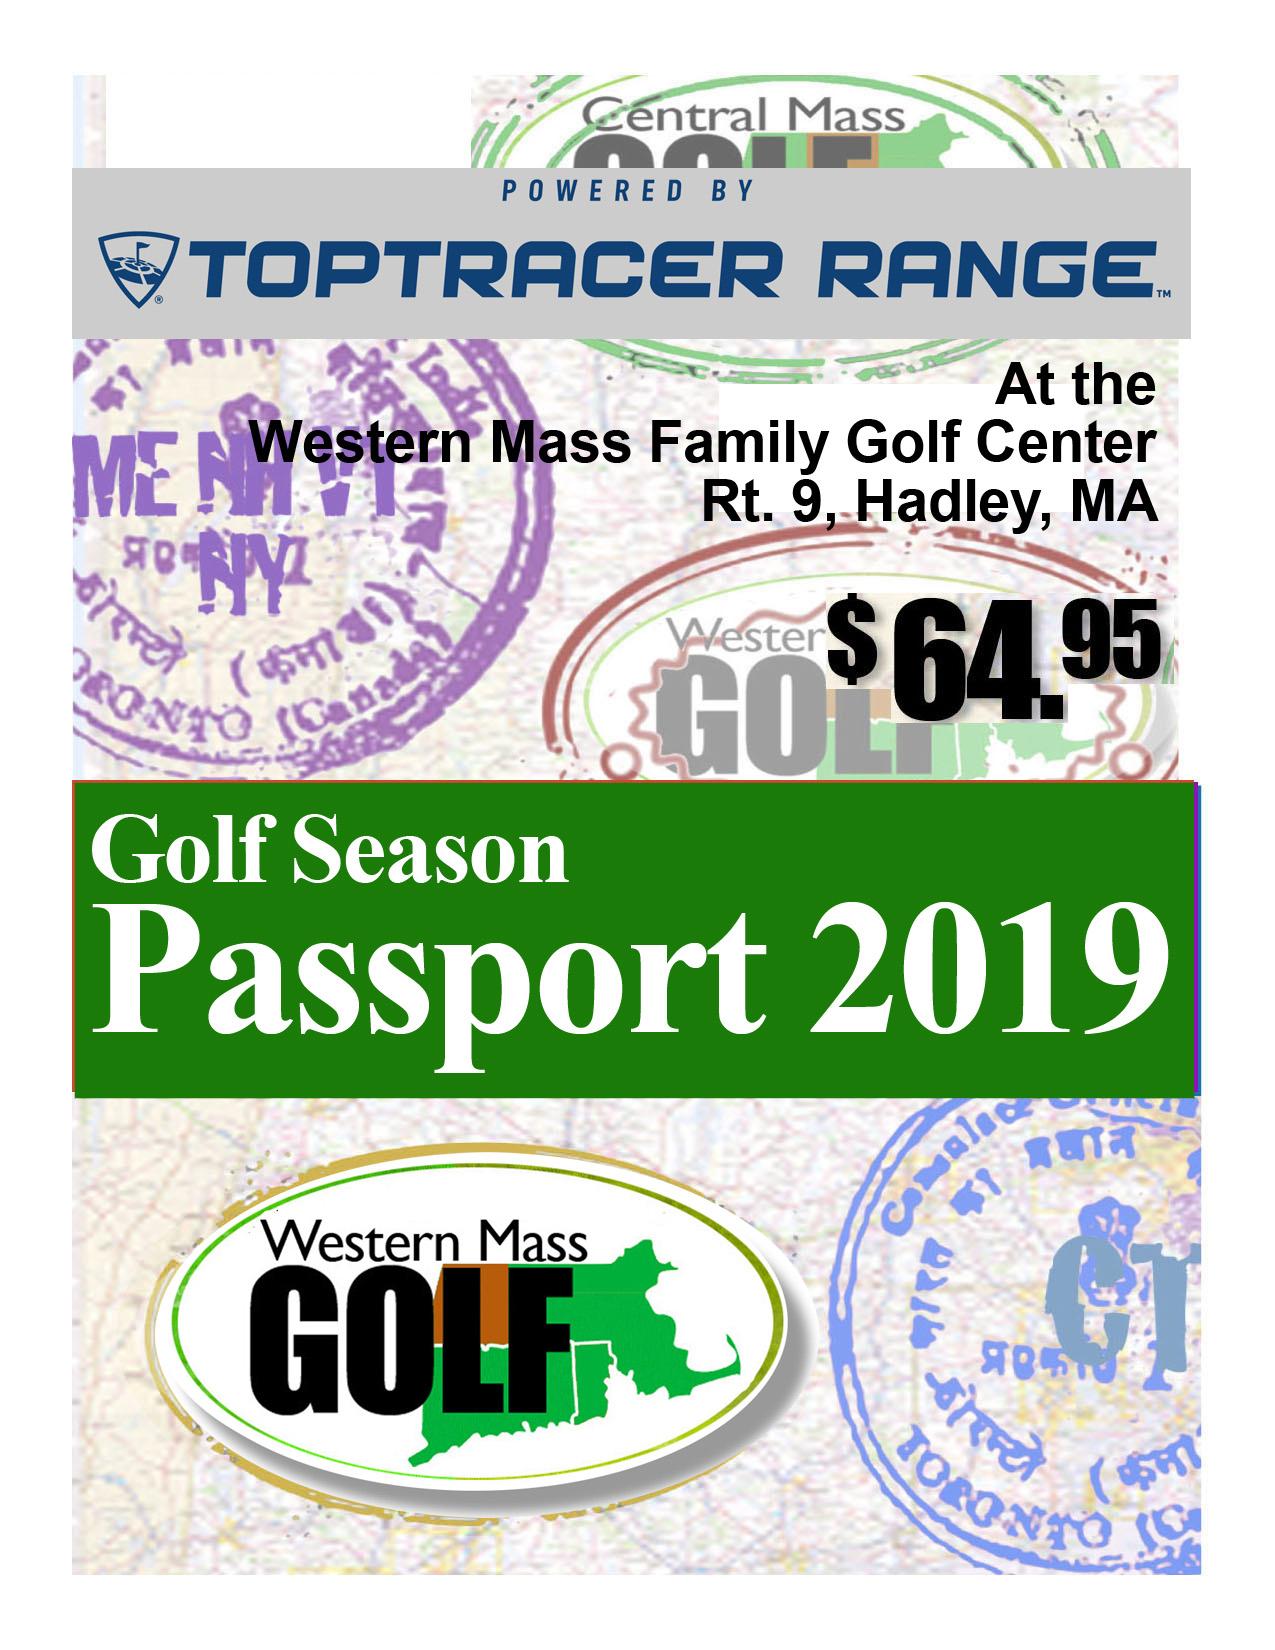 SNE Golfer Homepage - Southern New England Golfer